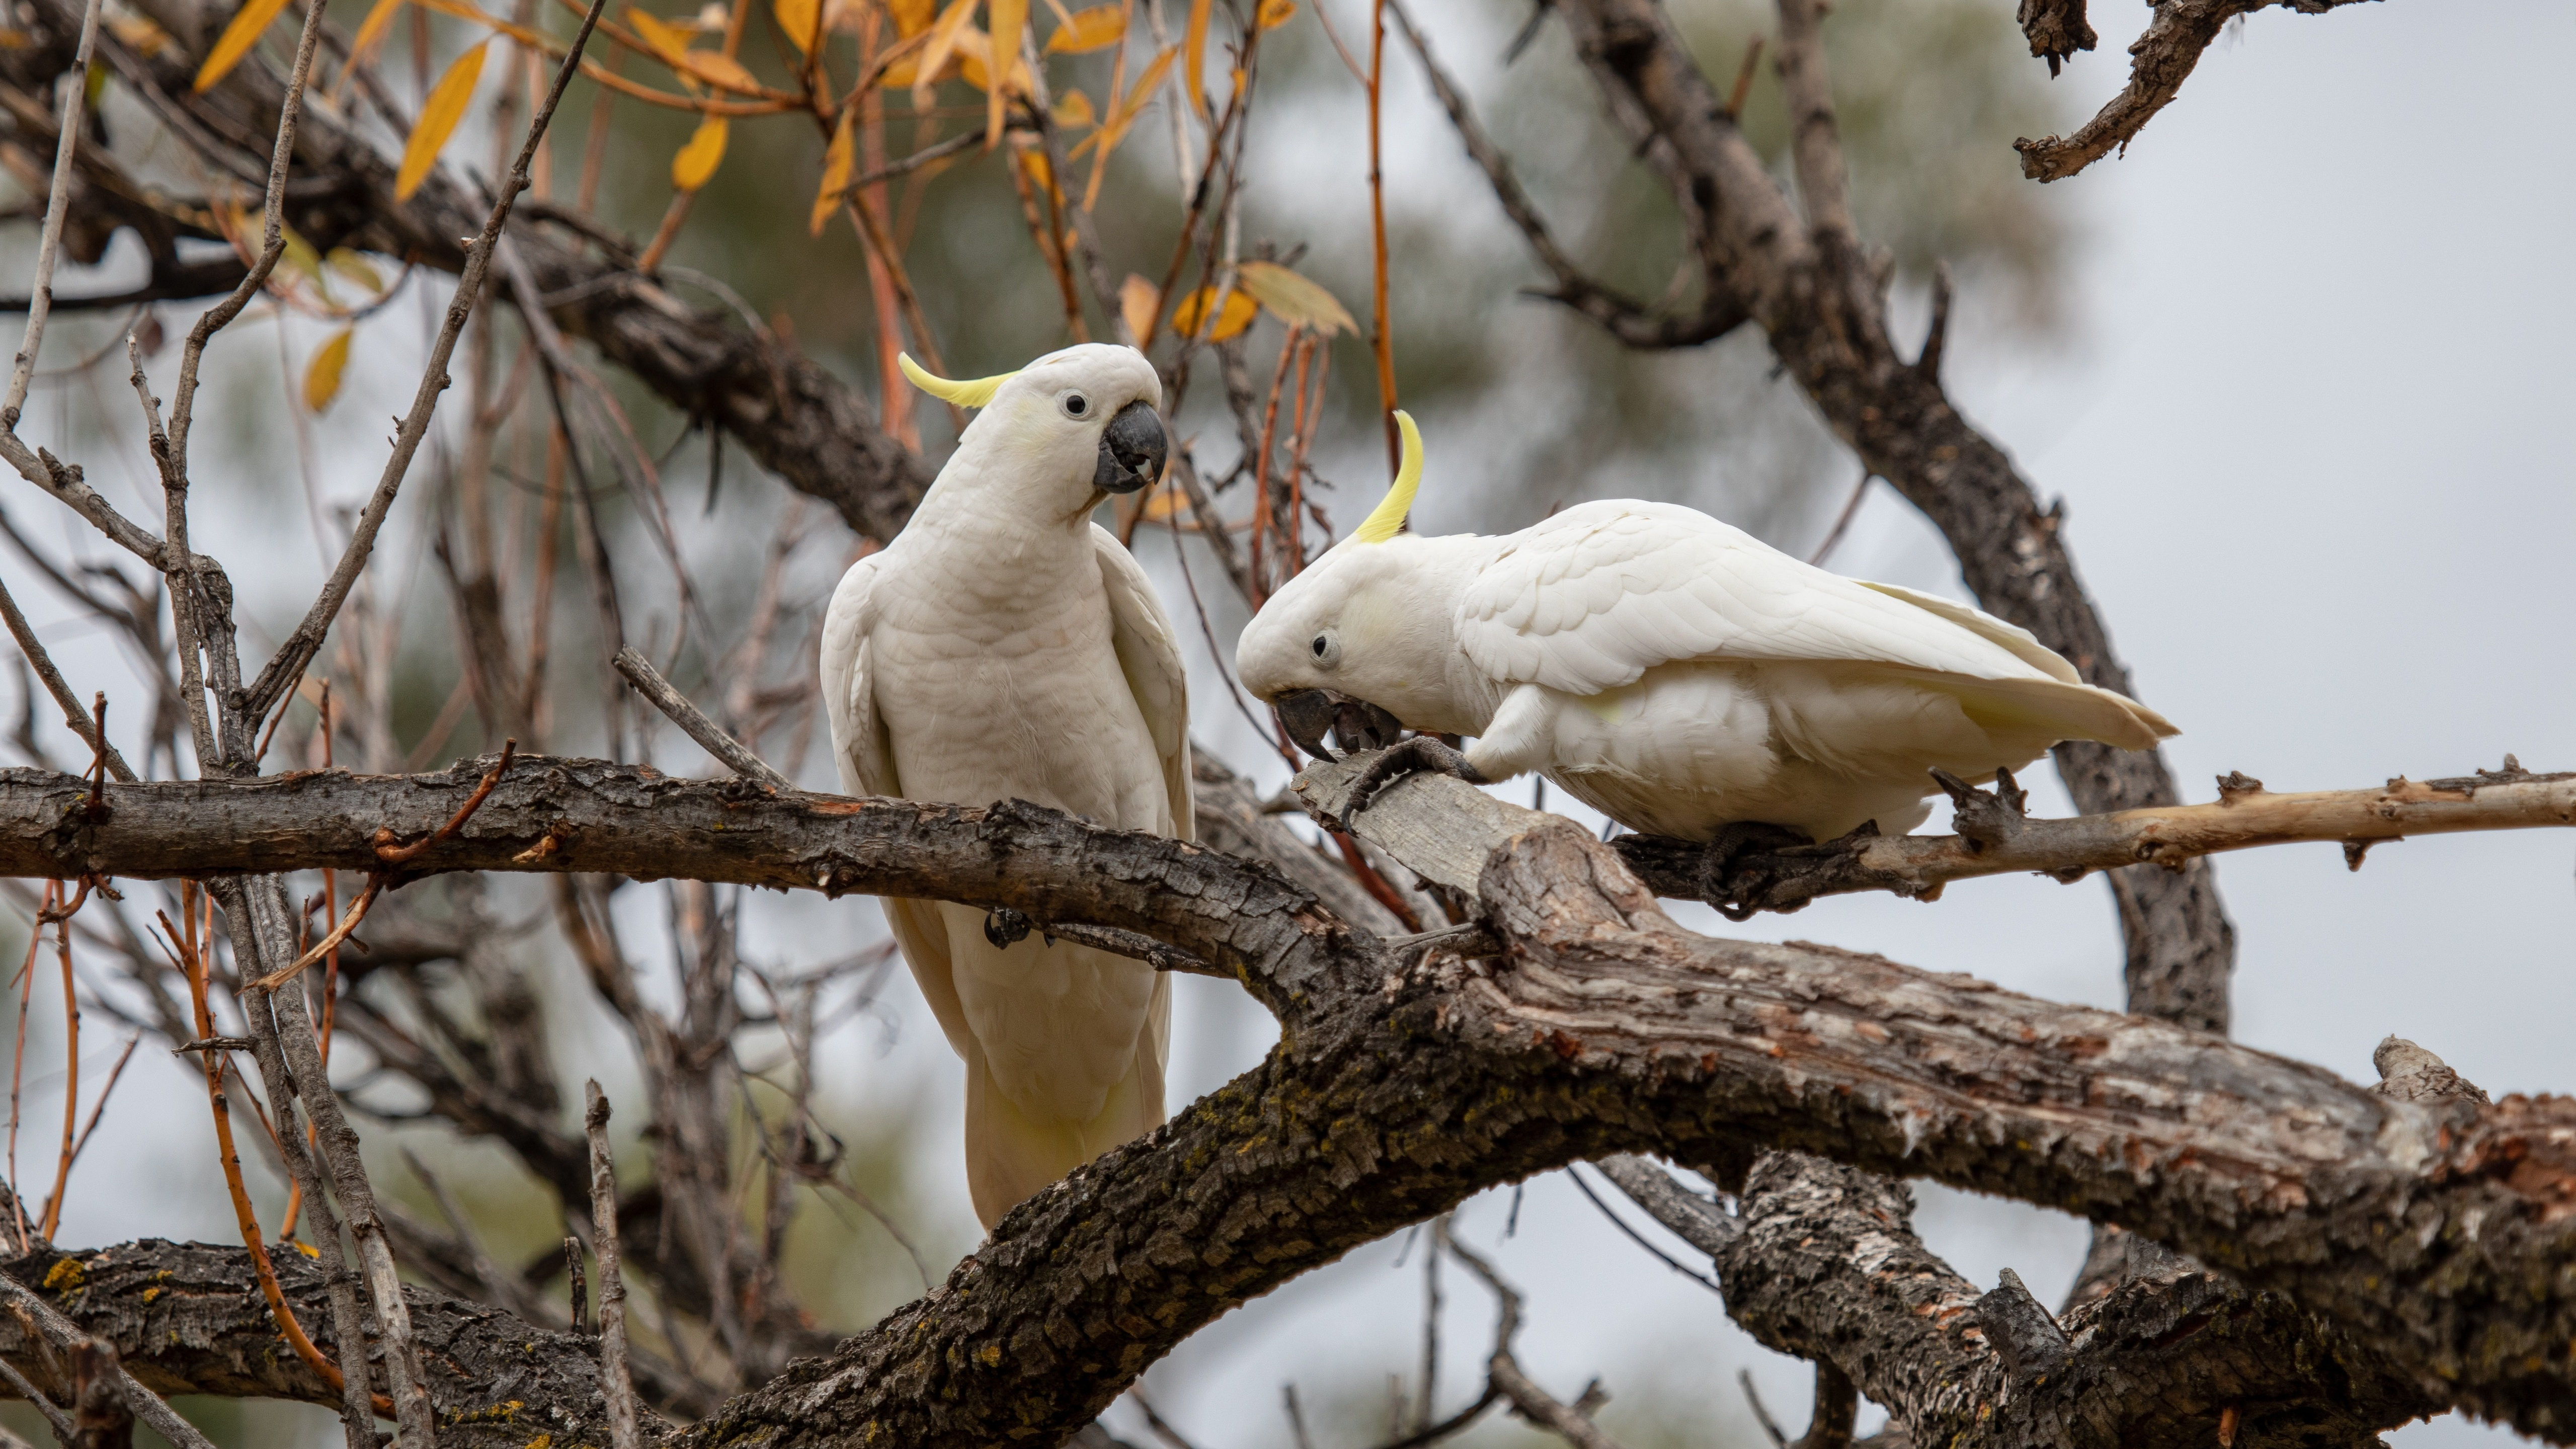 cockatoo-parrots-5k-1v.jpg